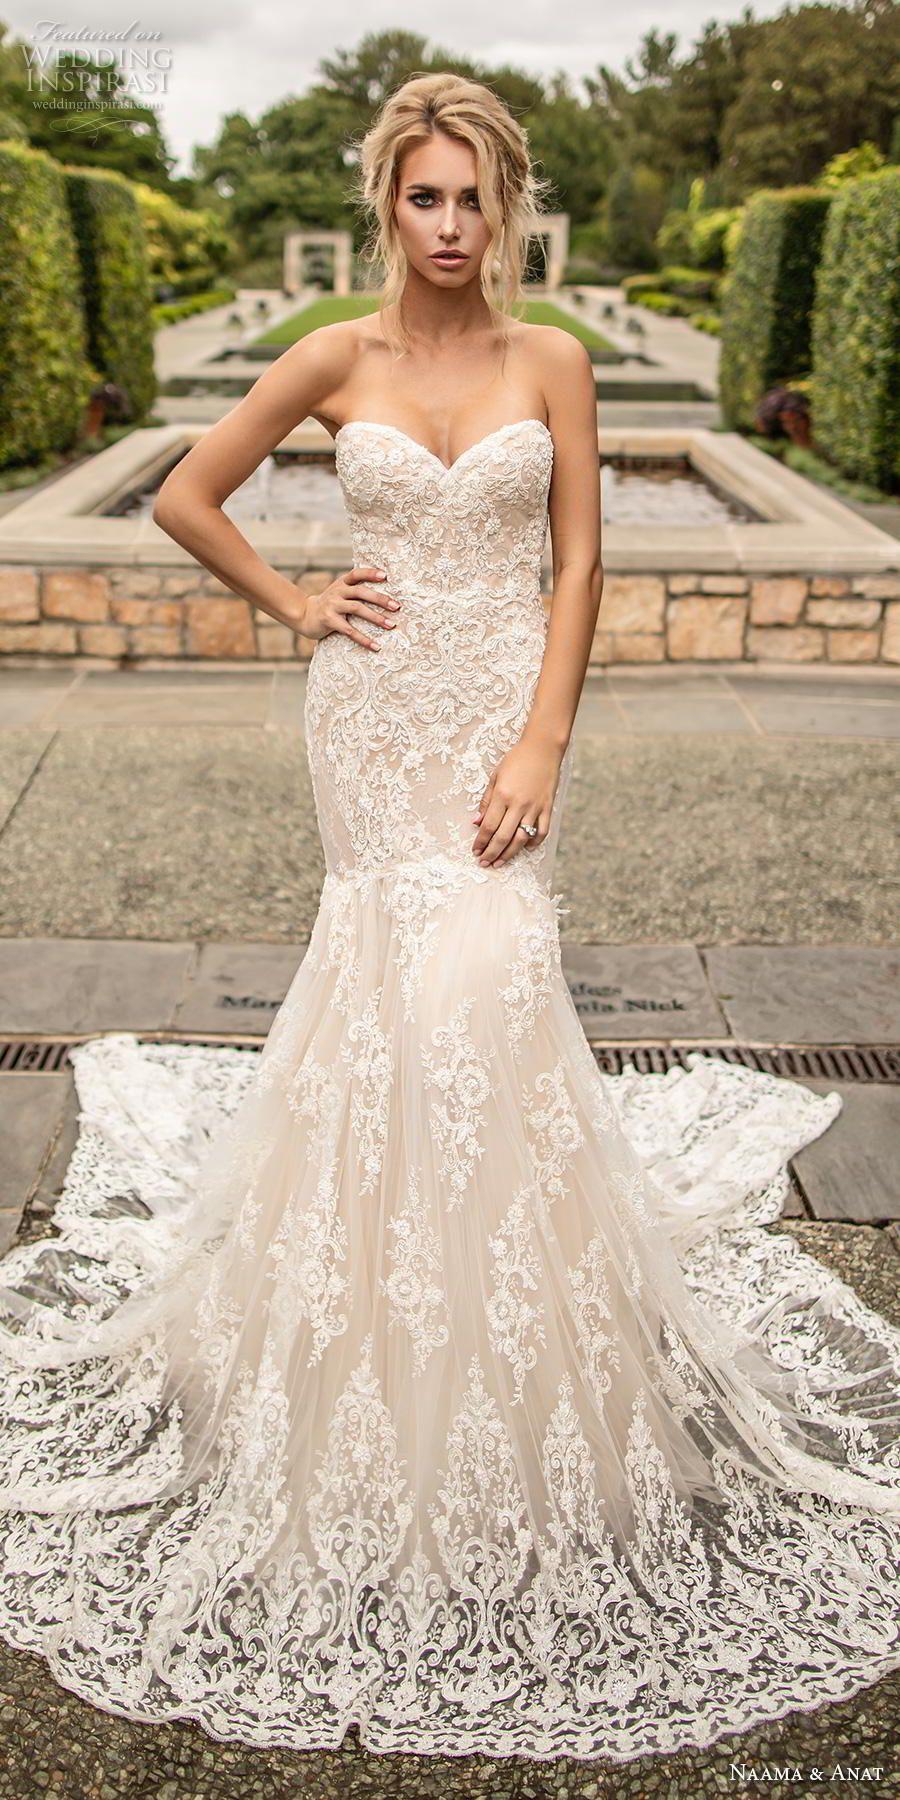 Naama Anat Couture Wedding Dresses Fall 2019 Wedding Inspirasi Wedding Dresses Sweetheart Neckline Wedding Dresses Mermaid Sweetheart Backless Mermaid Wedding Dresses [ 1800 x 900 Pixel ]